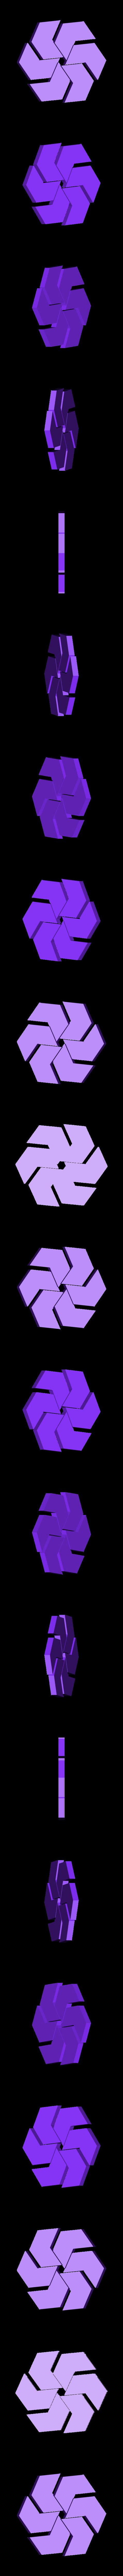 HexStarInner.stl Download free STL file Hexagram, Hexagonal Star, Hexagon Puzzle • 3D printing model, LGBU